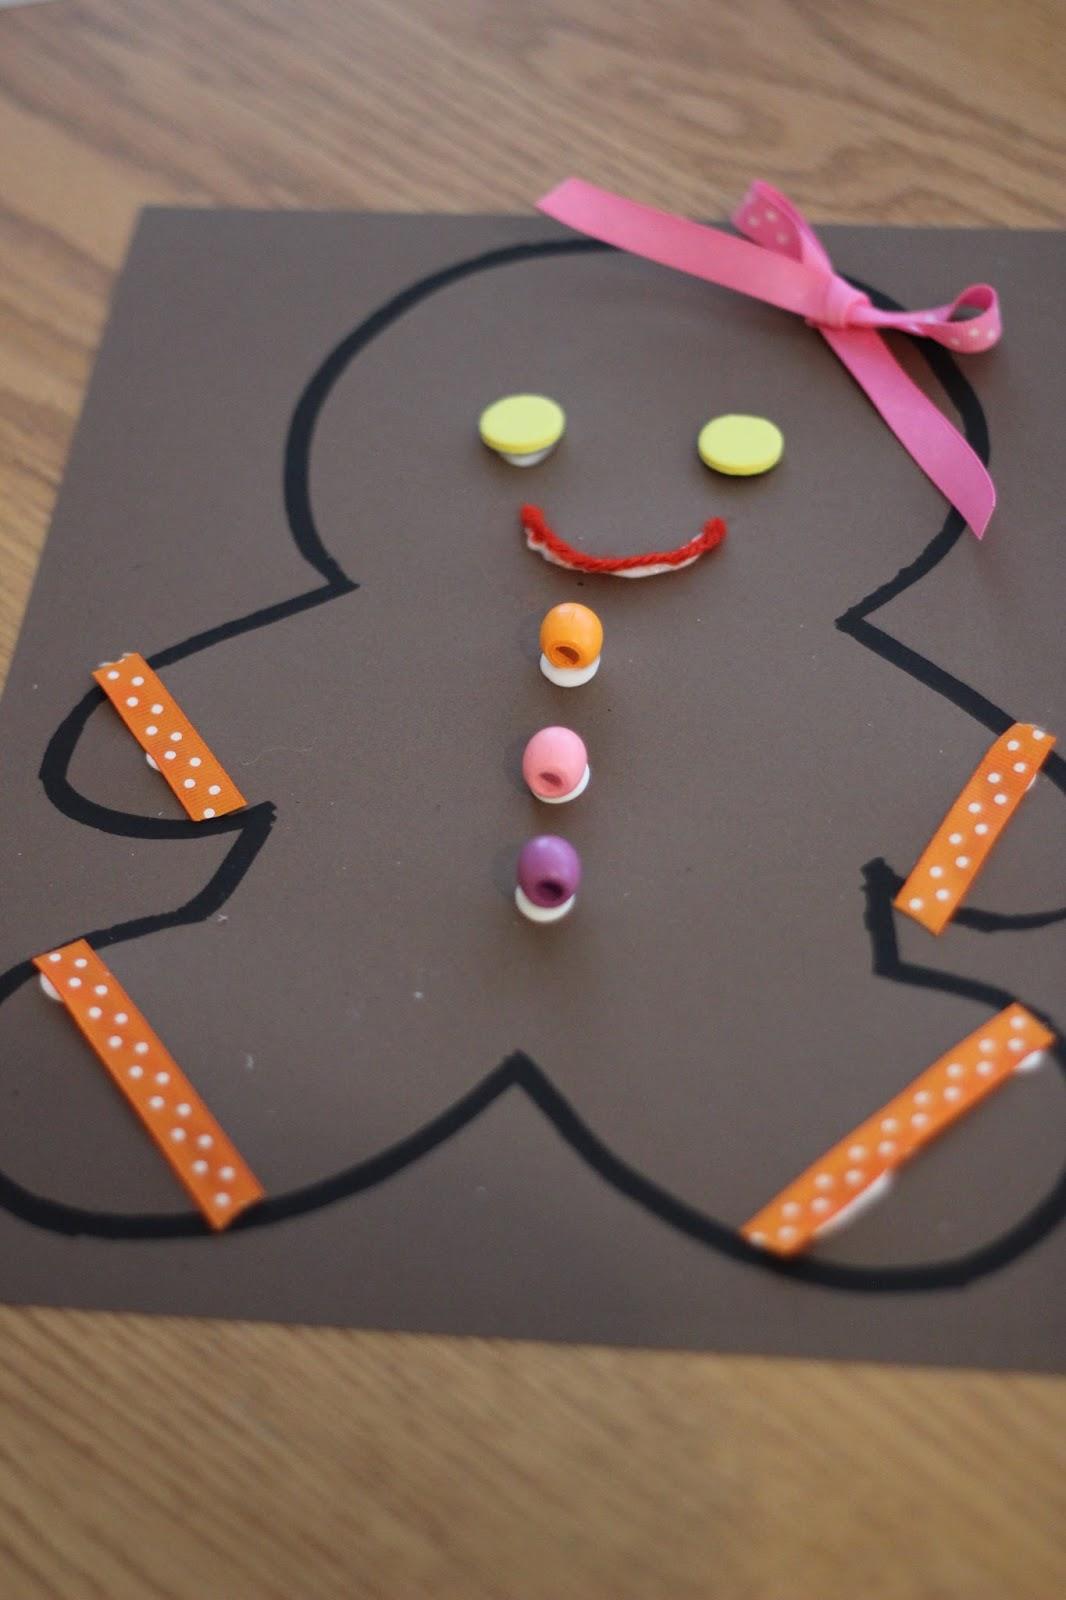 Toddler approved gingerbread man collage craft for Gingerbread crafts for kindergarten